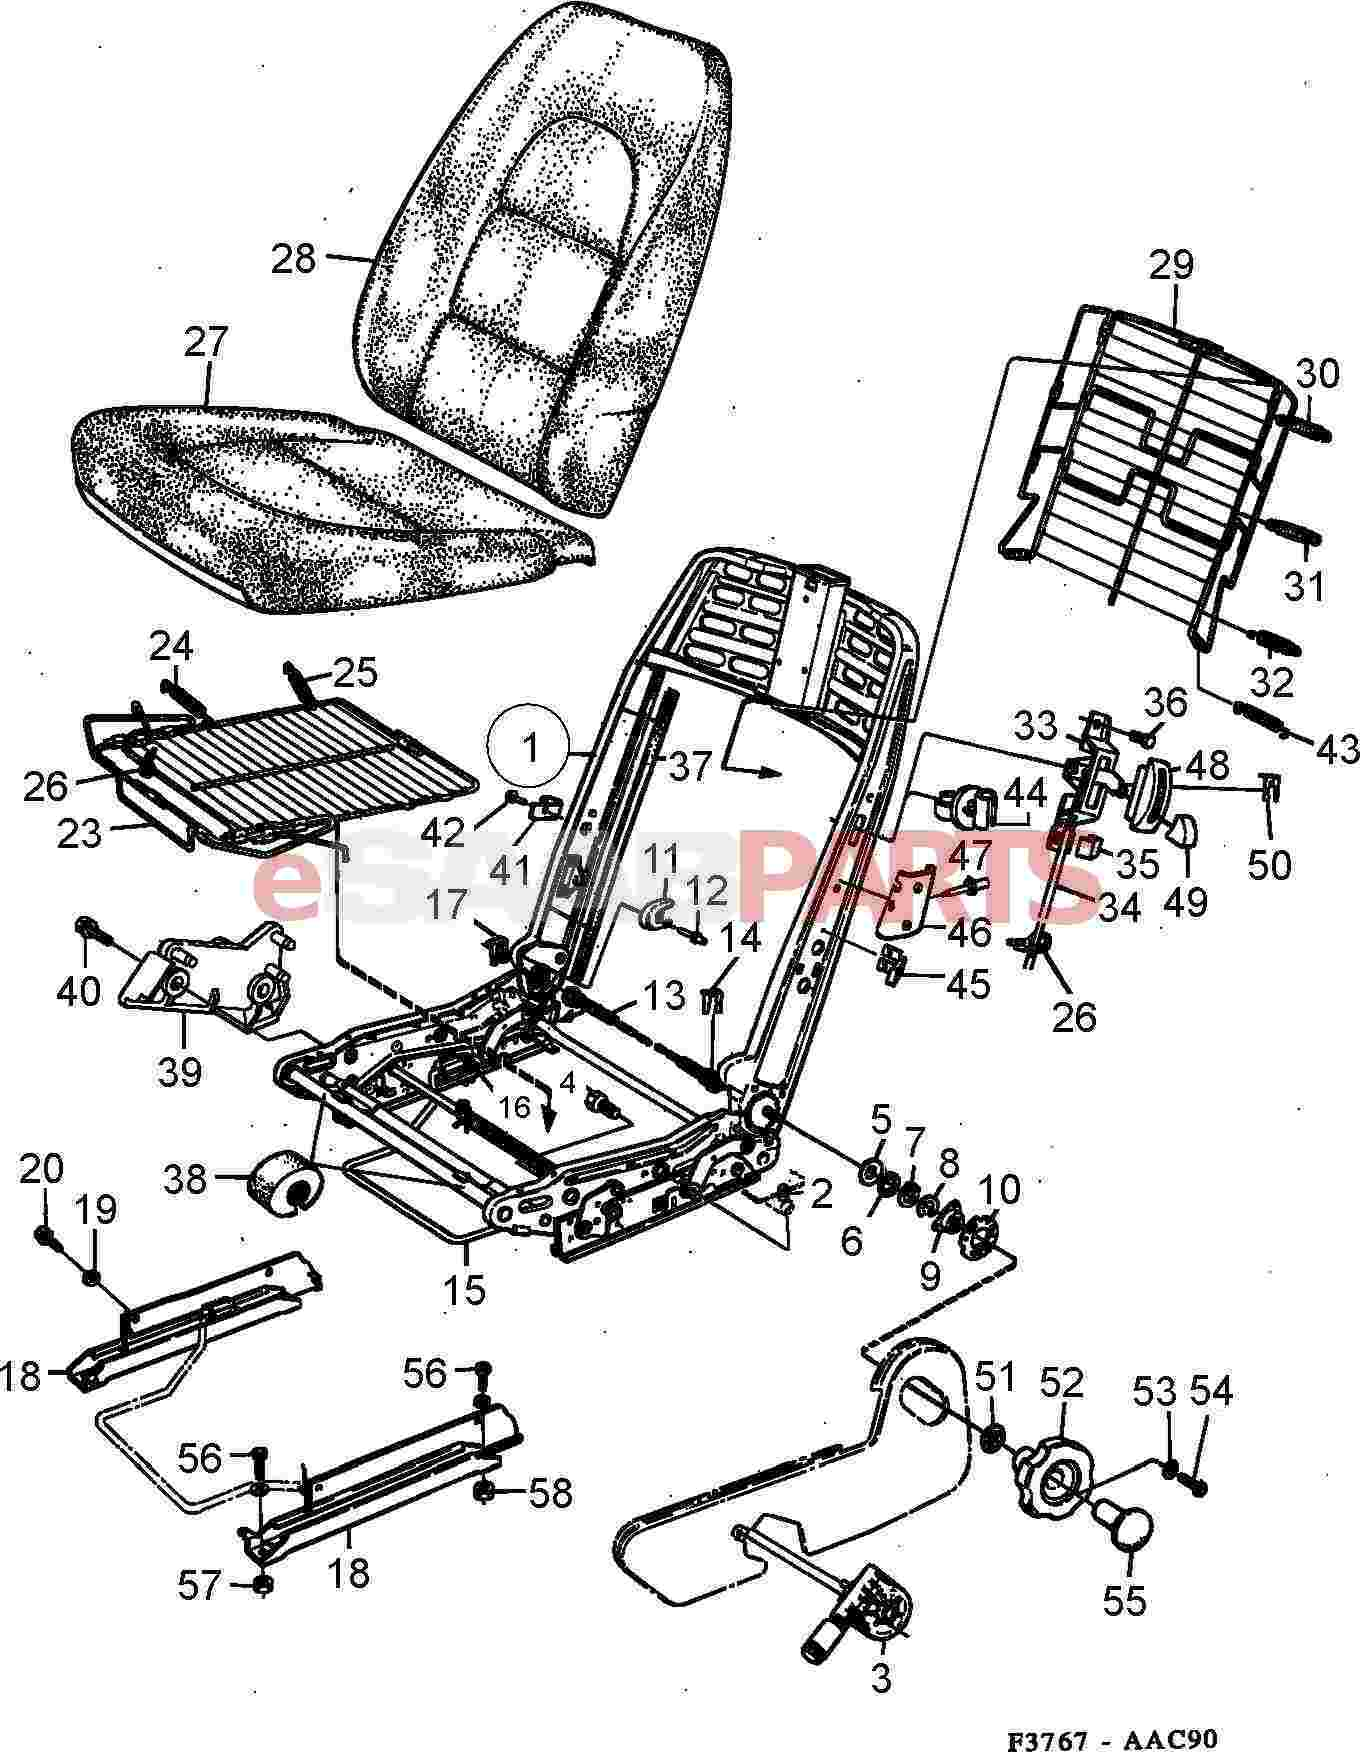 Internal parts of a car with s honda car engine parts diagram at ww2